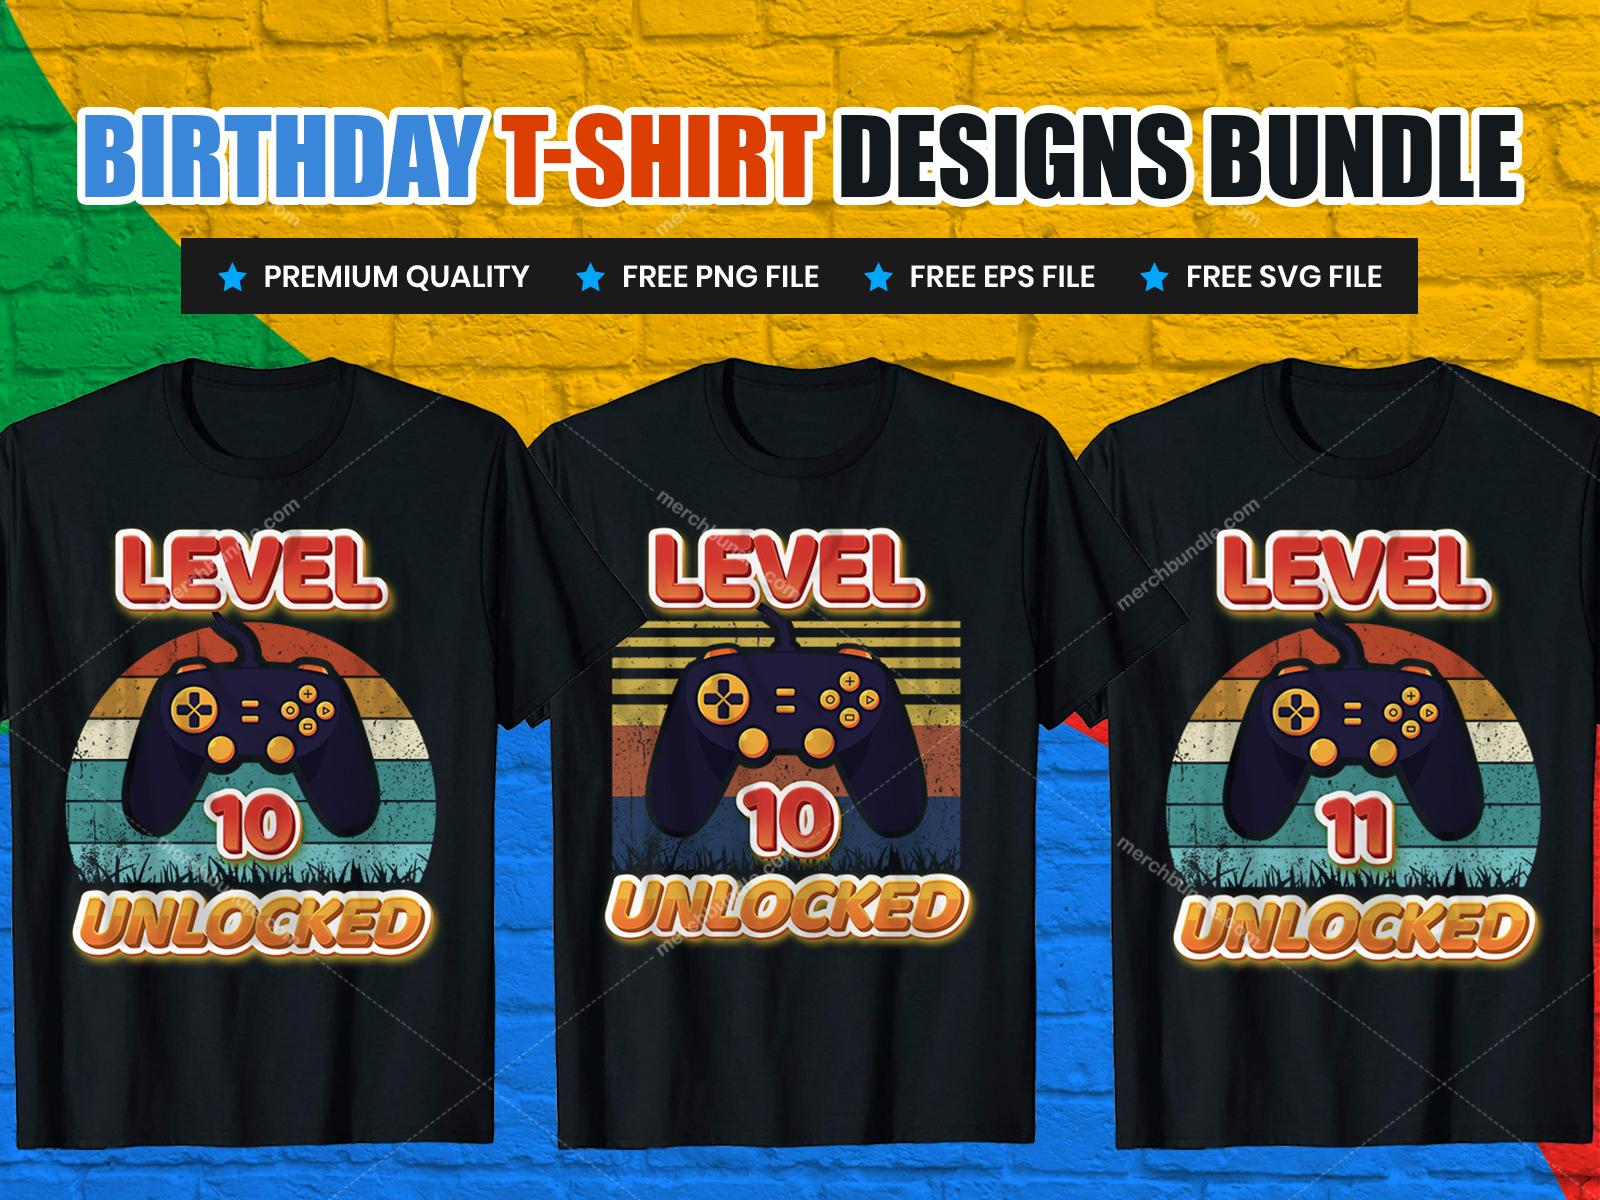 Happy Birthday T-Shirt Design